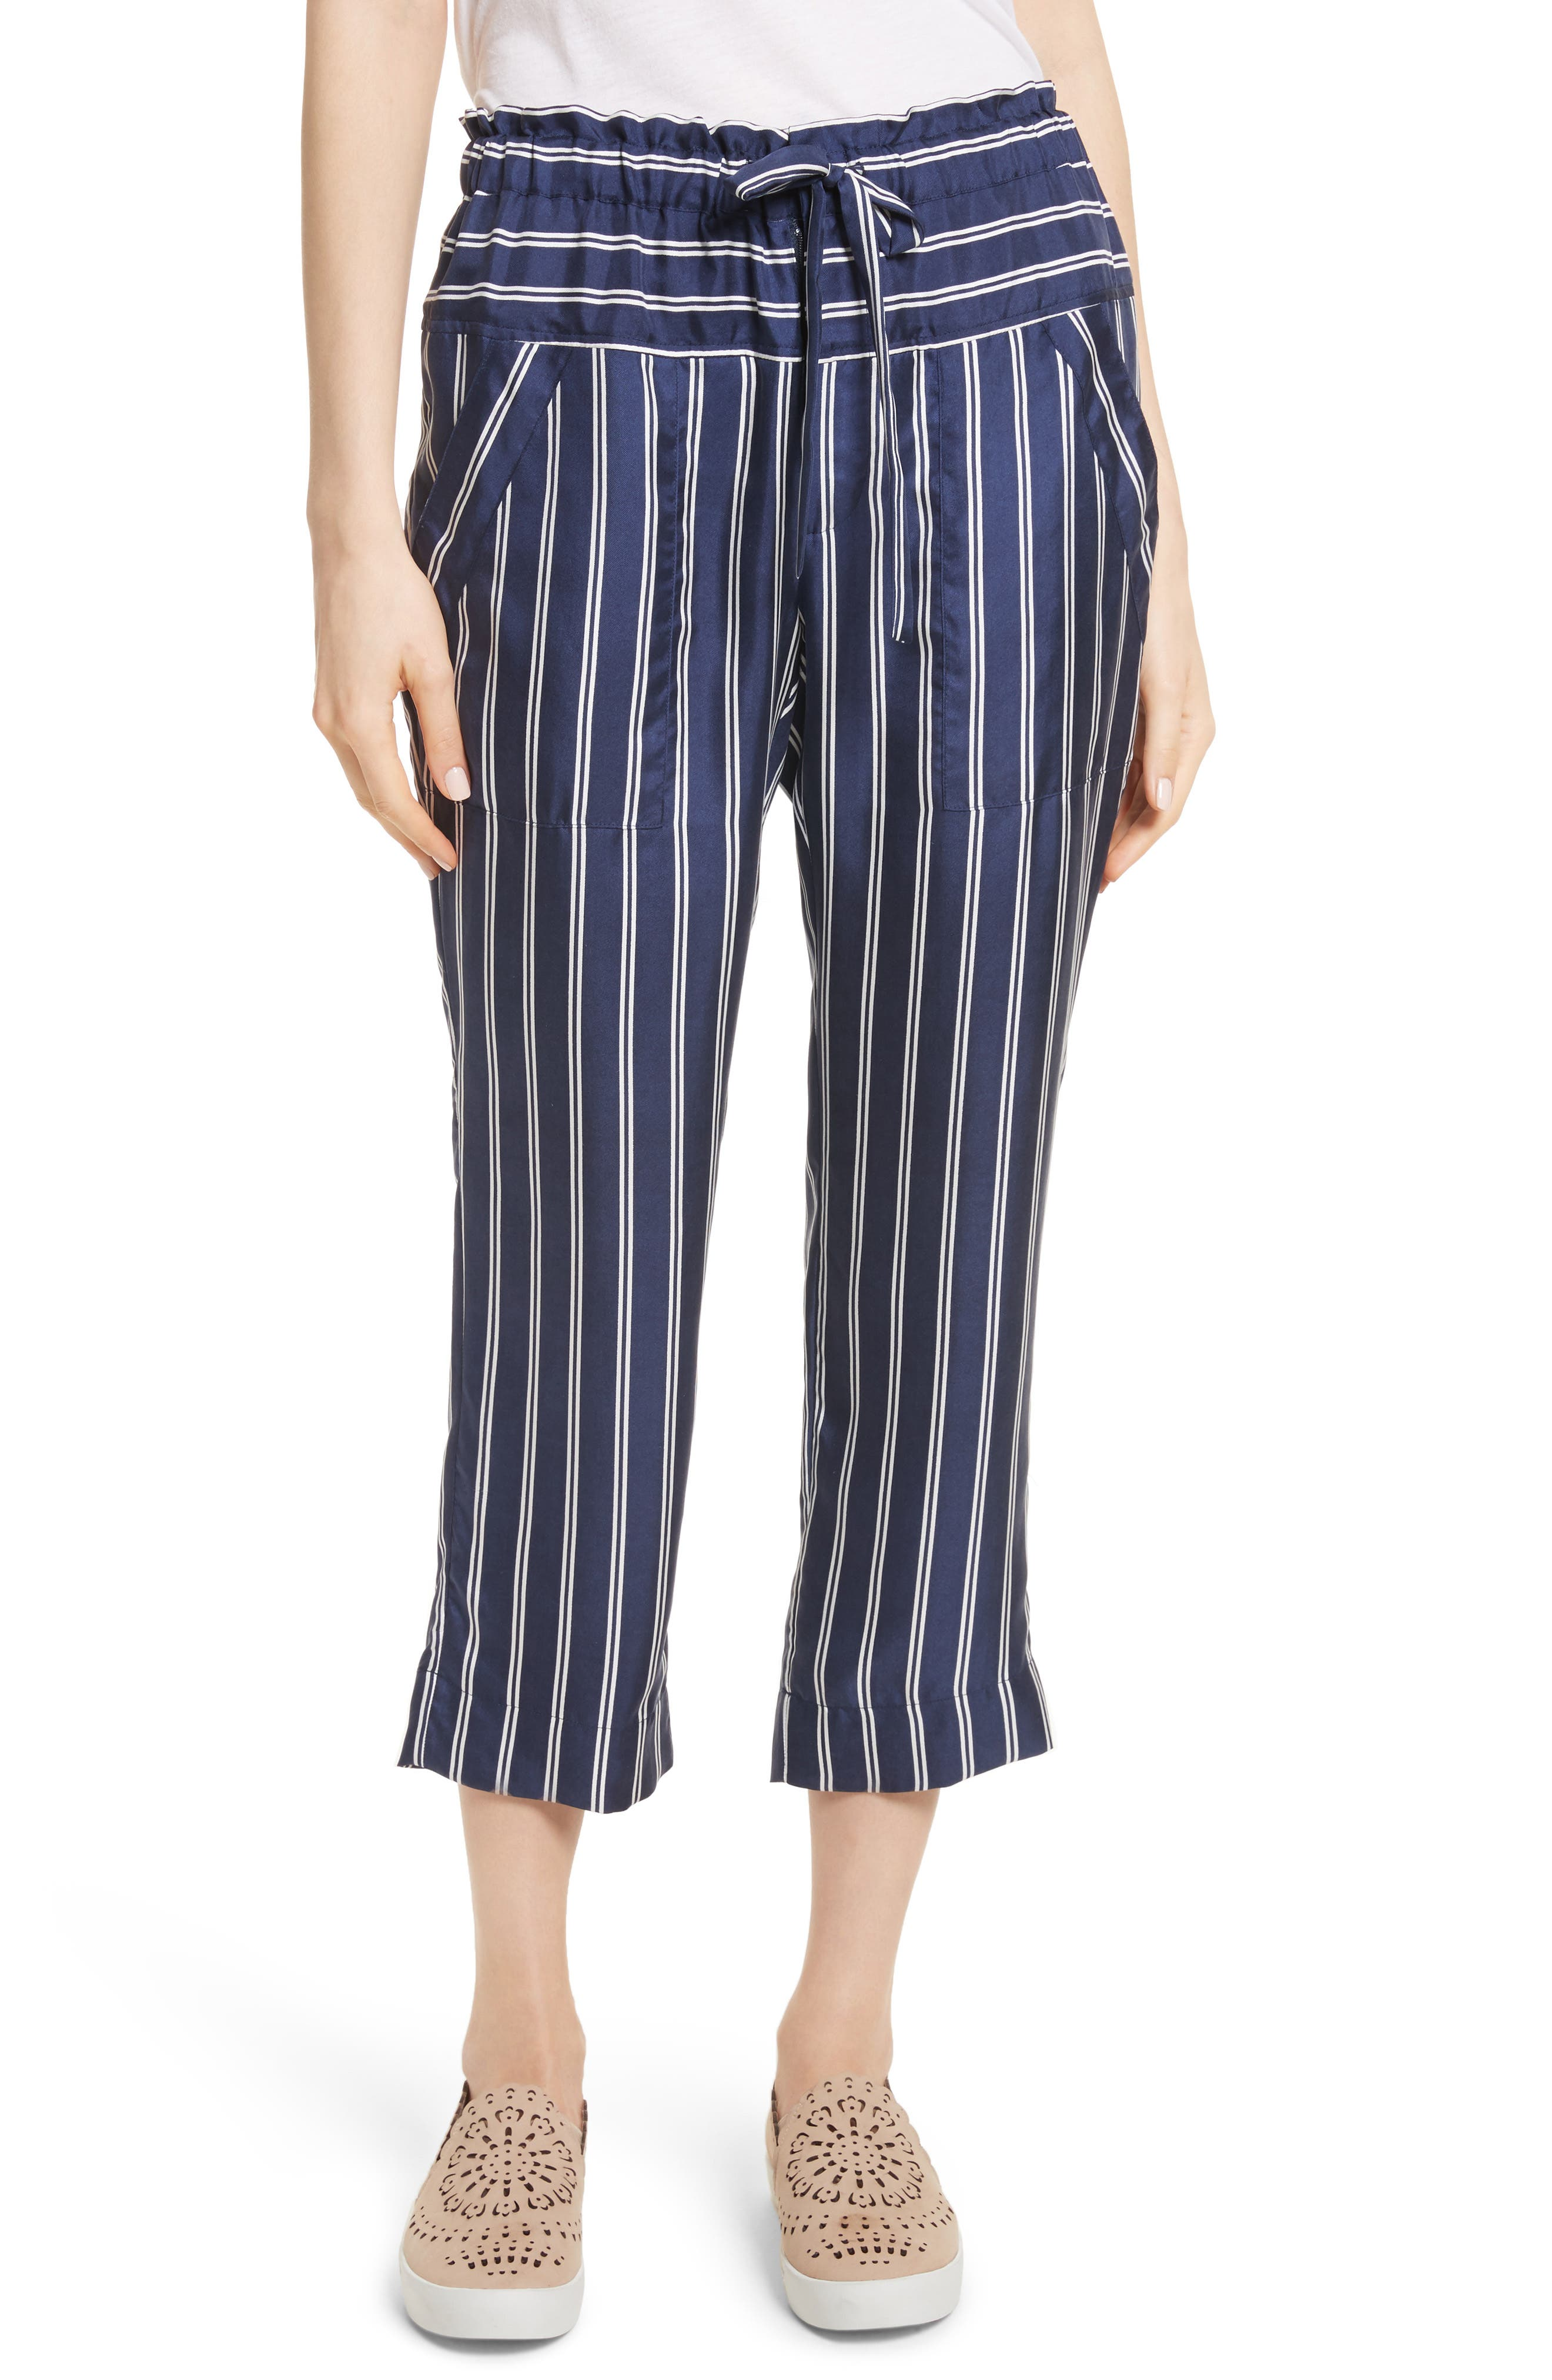 Addiena Stripe Silk Pants,                         Main,                         color, 418